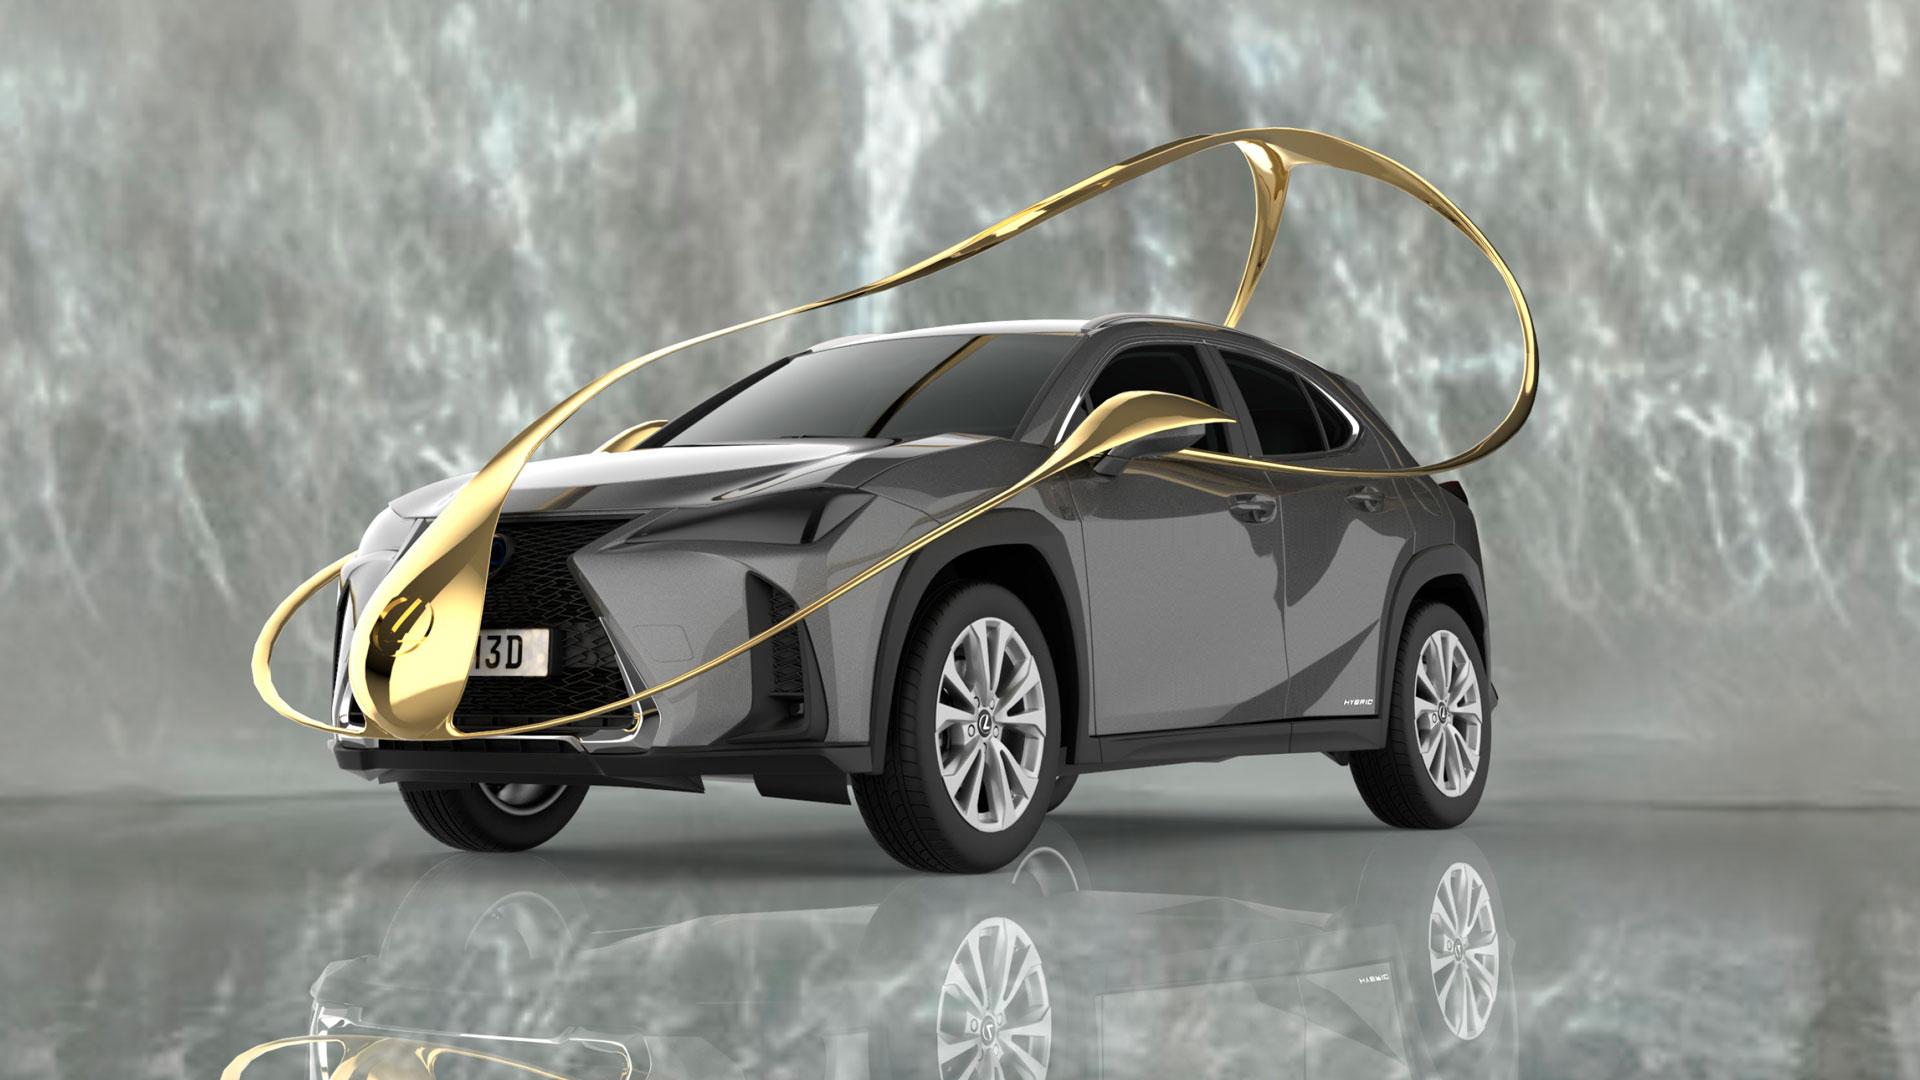 Lexus UX Art Car by Ana Roquero hero asset